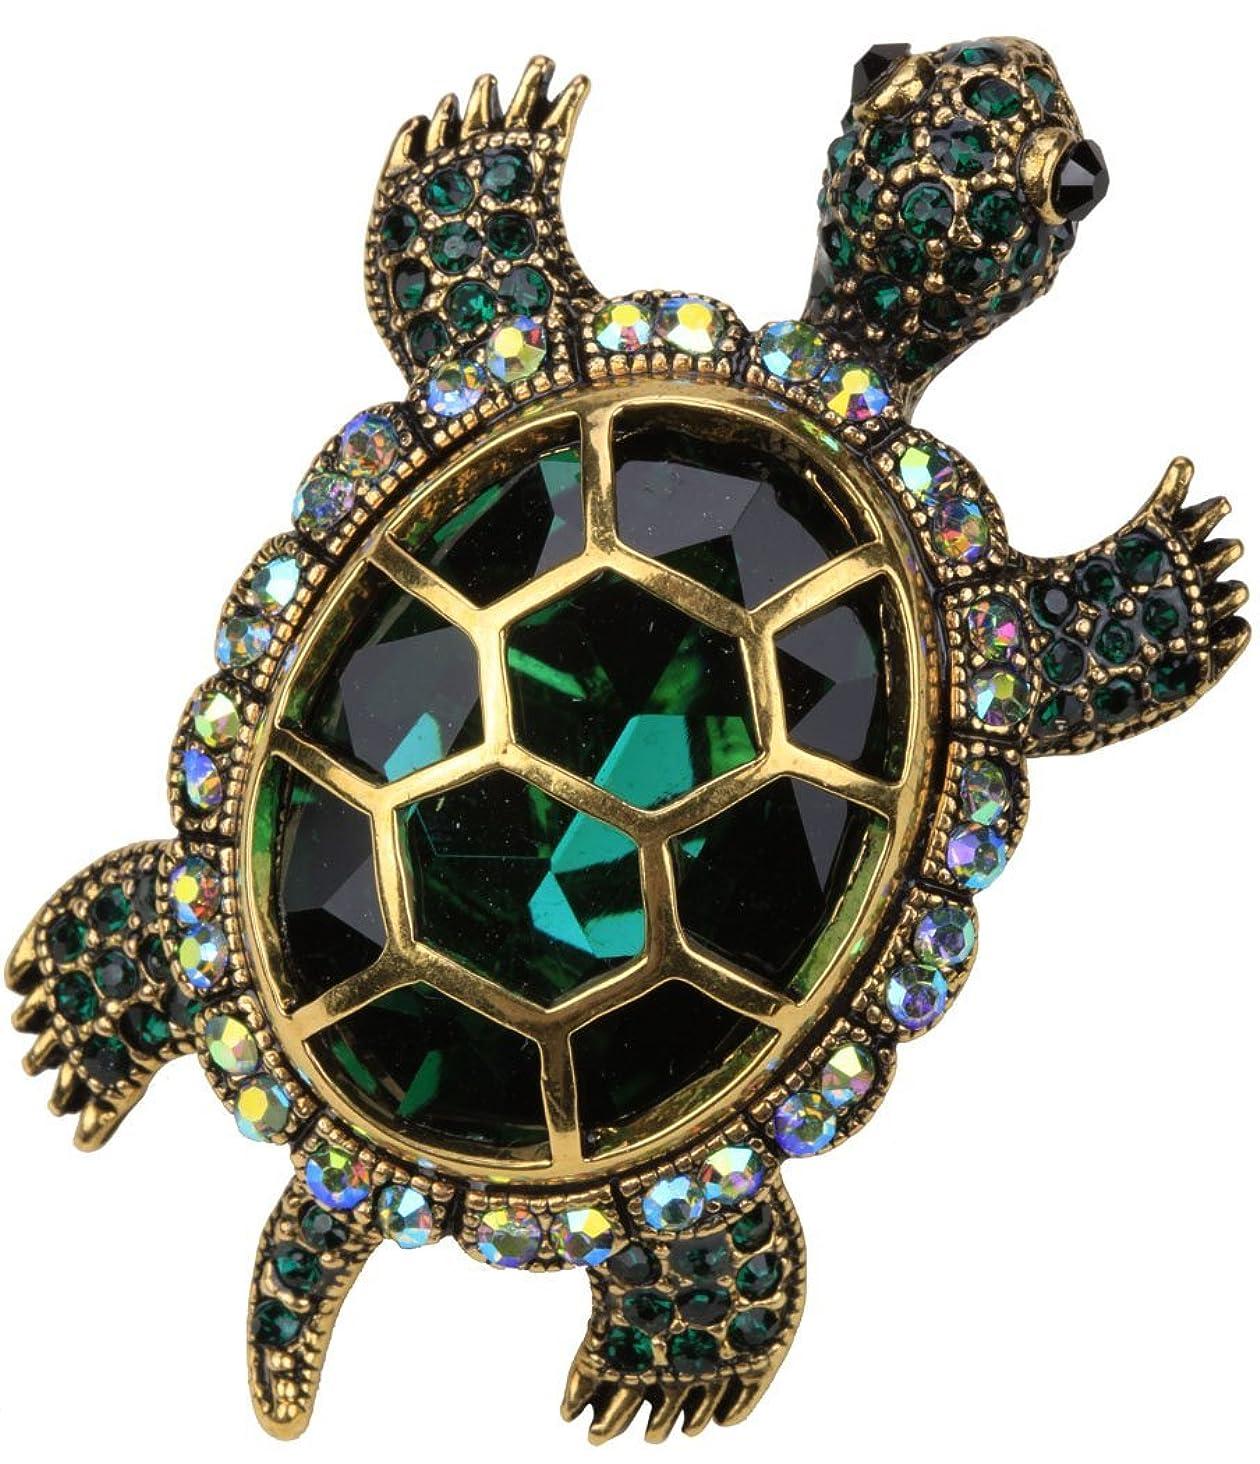 YACQ Women's Crystal Big Turtle Pin Brooch Pendant Halloween Costume Jewelry Accessories